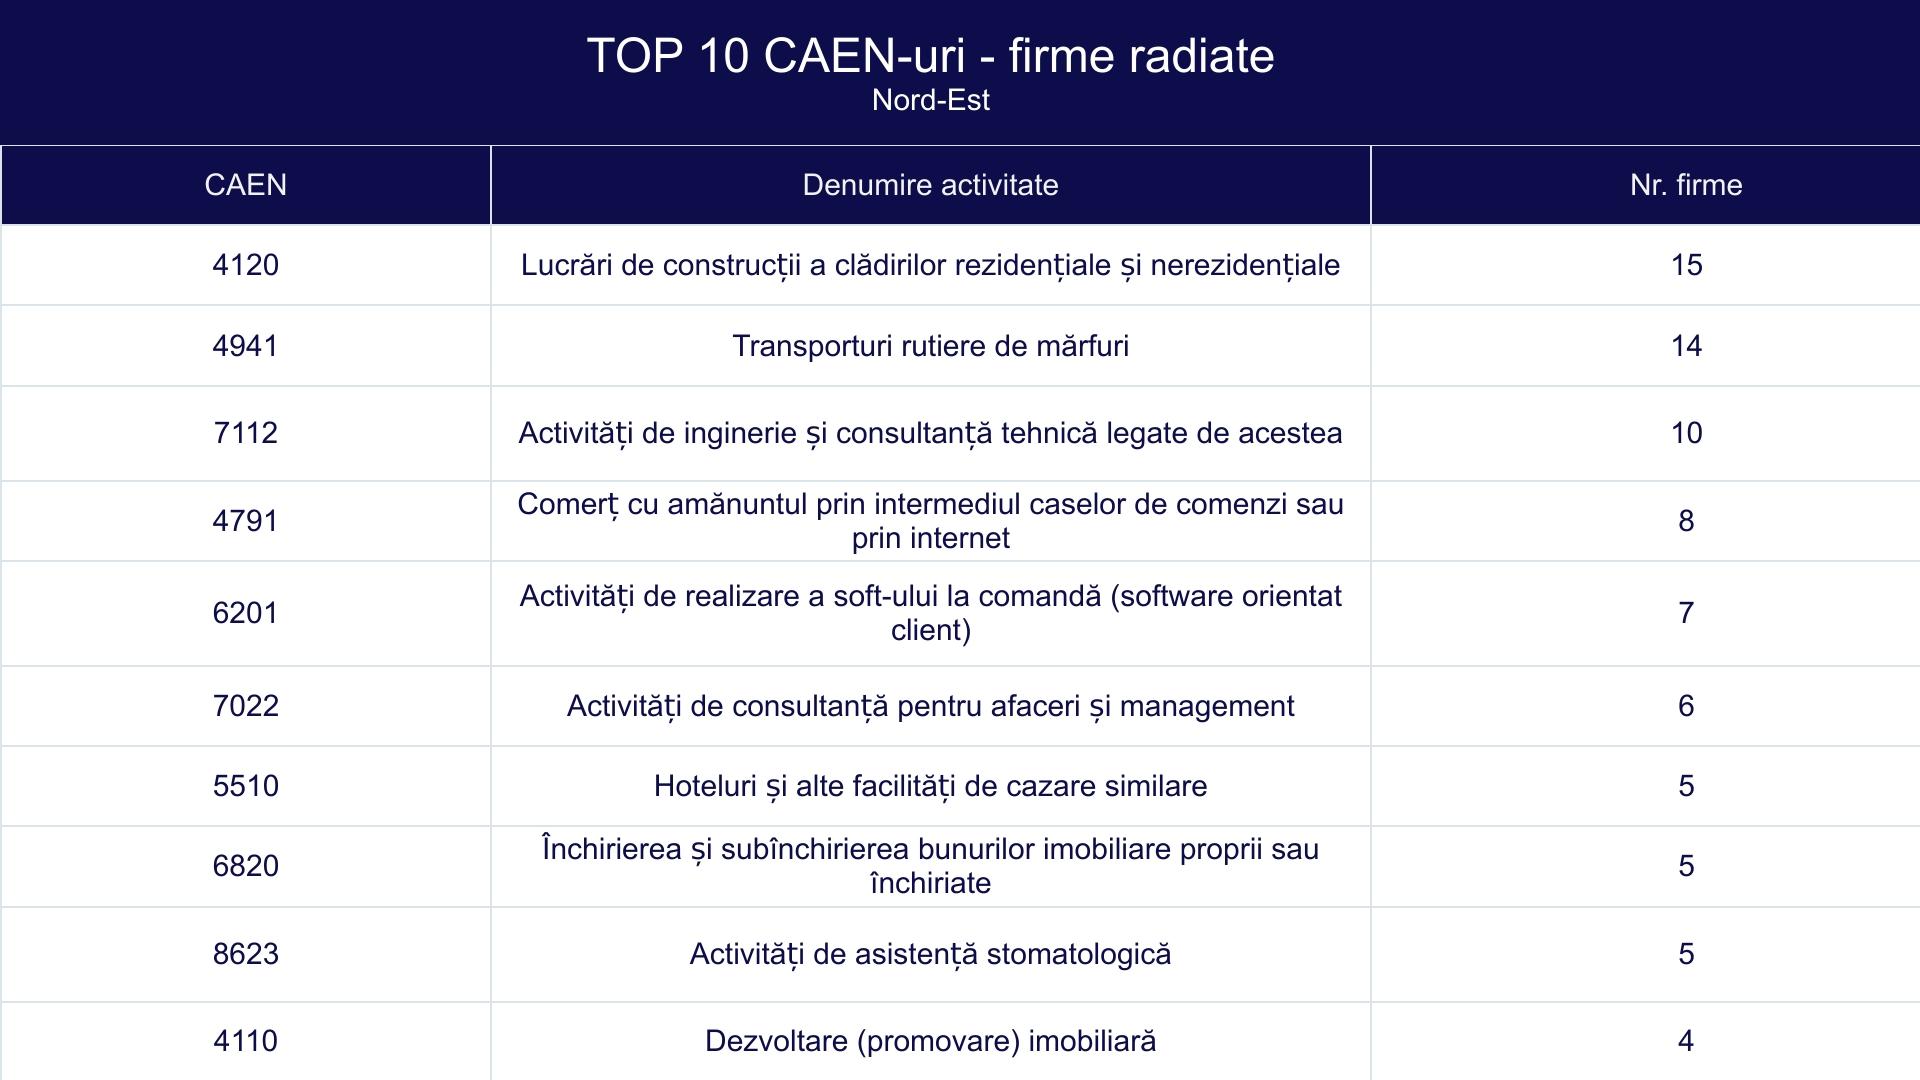 TOP 10 CAEN-uri - firme radiate - Nord-Est